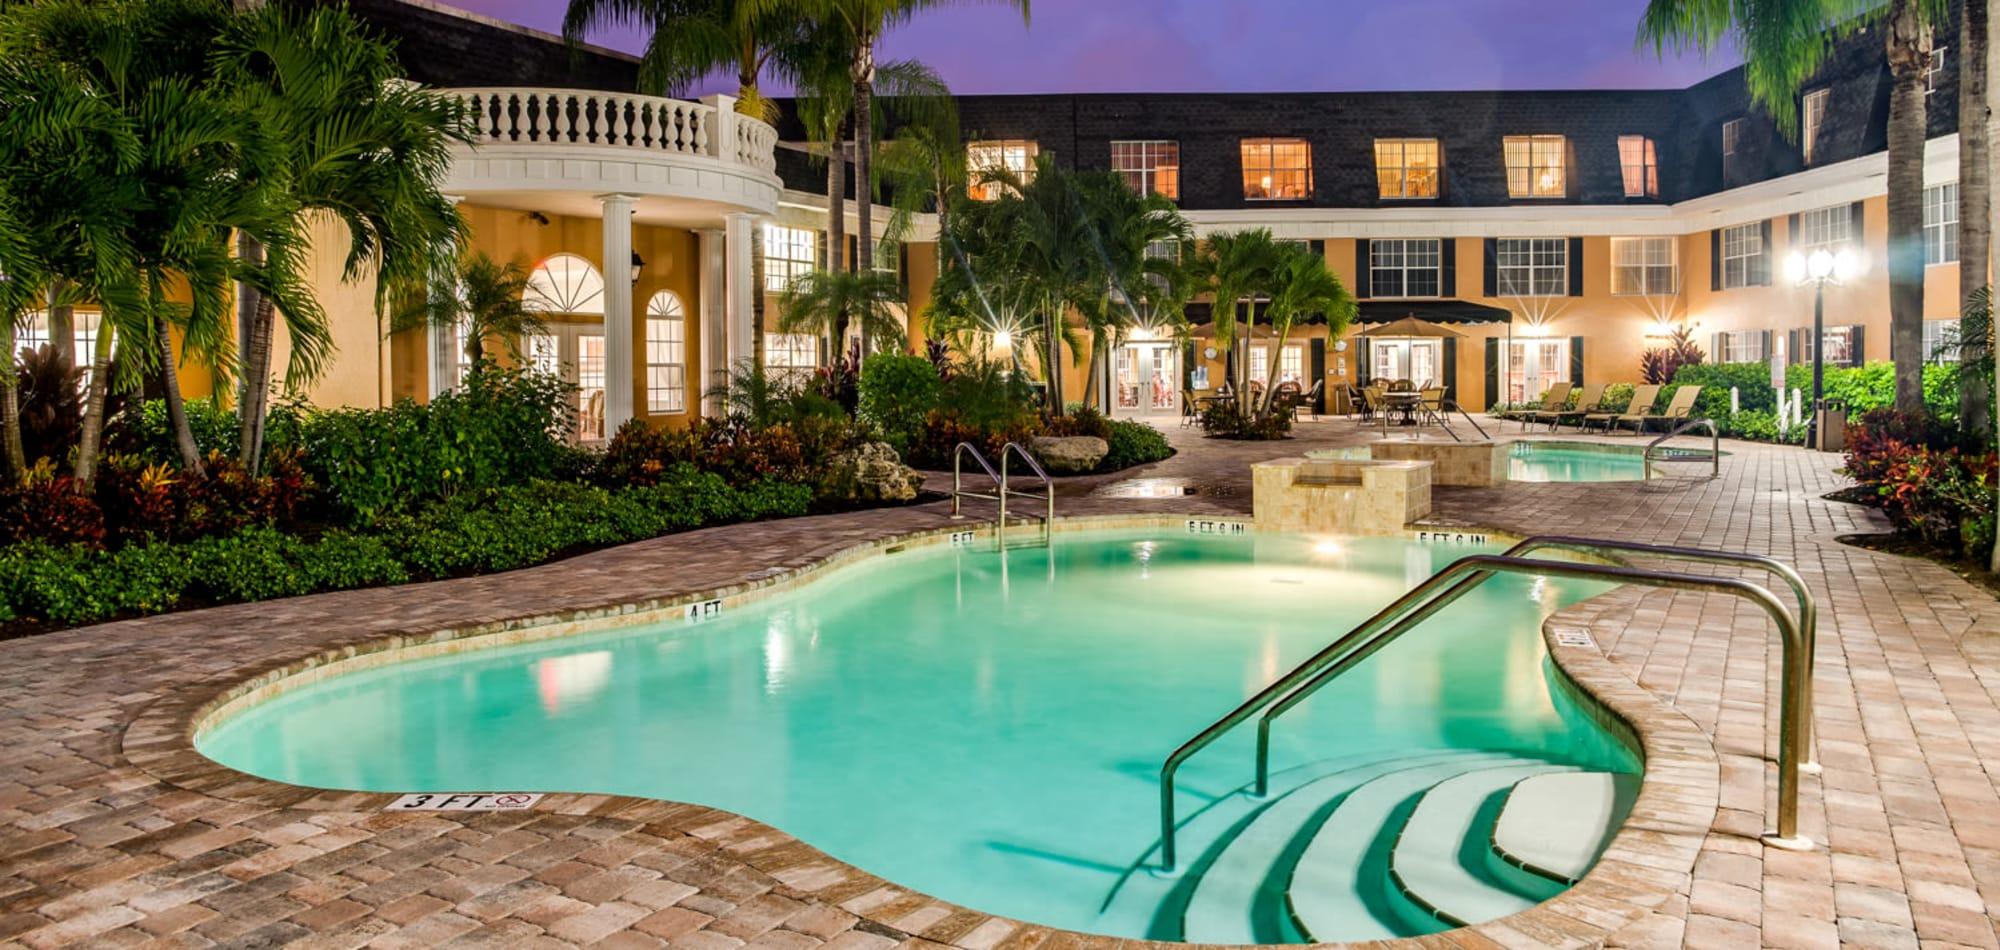 Grand Villa of Delray West in Florida senior living